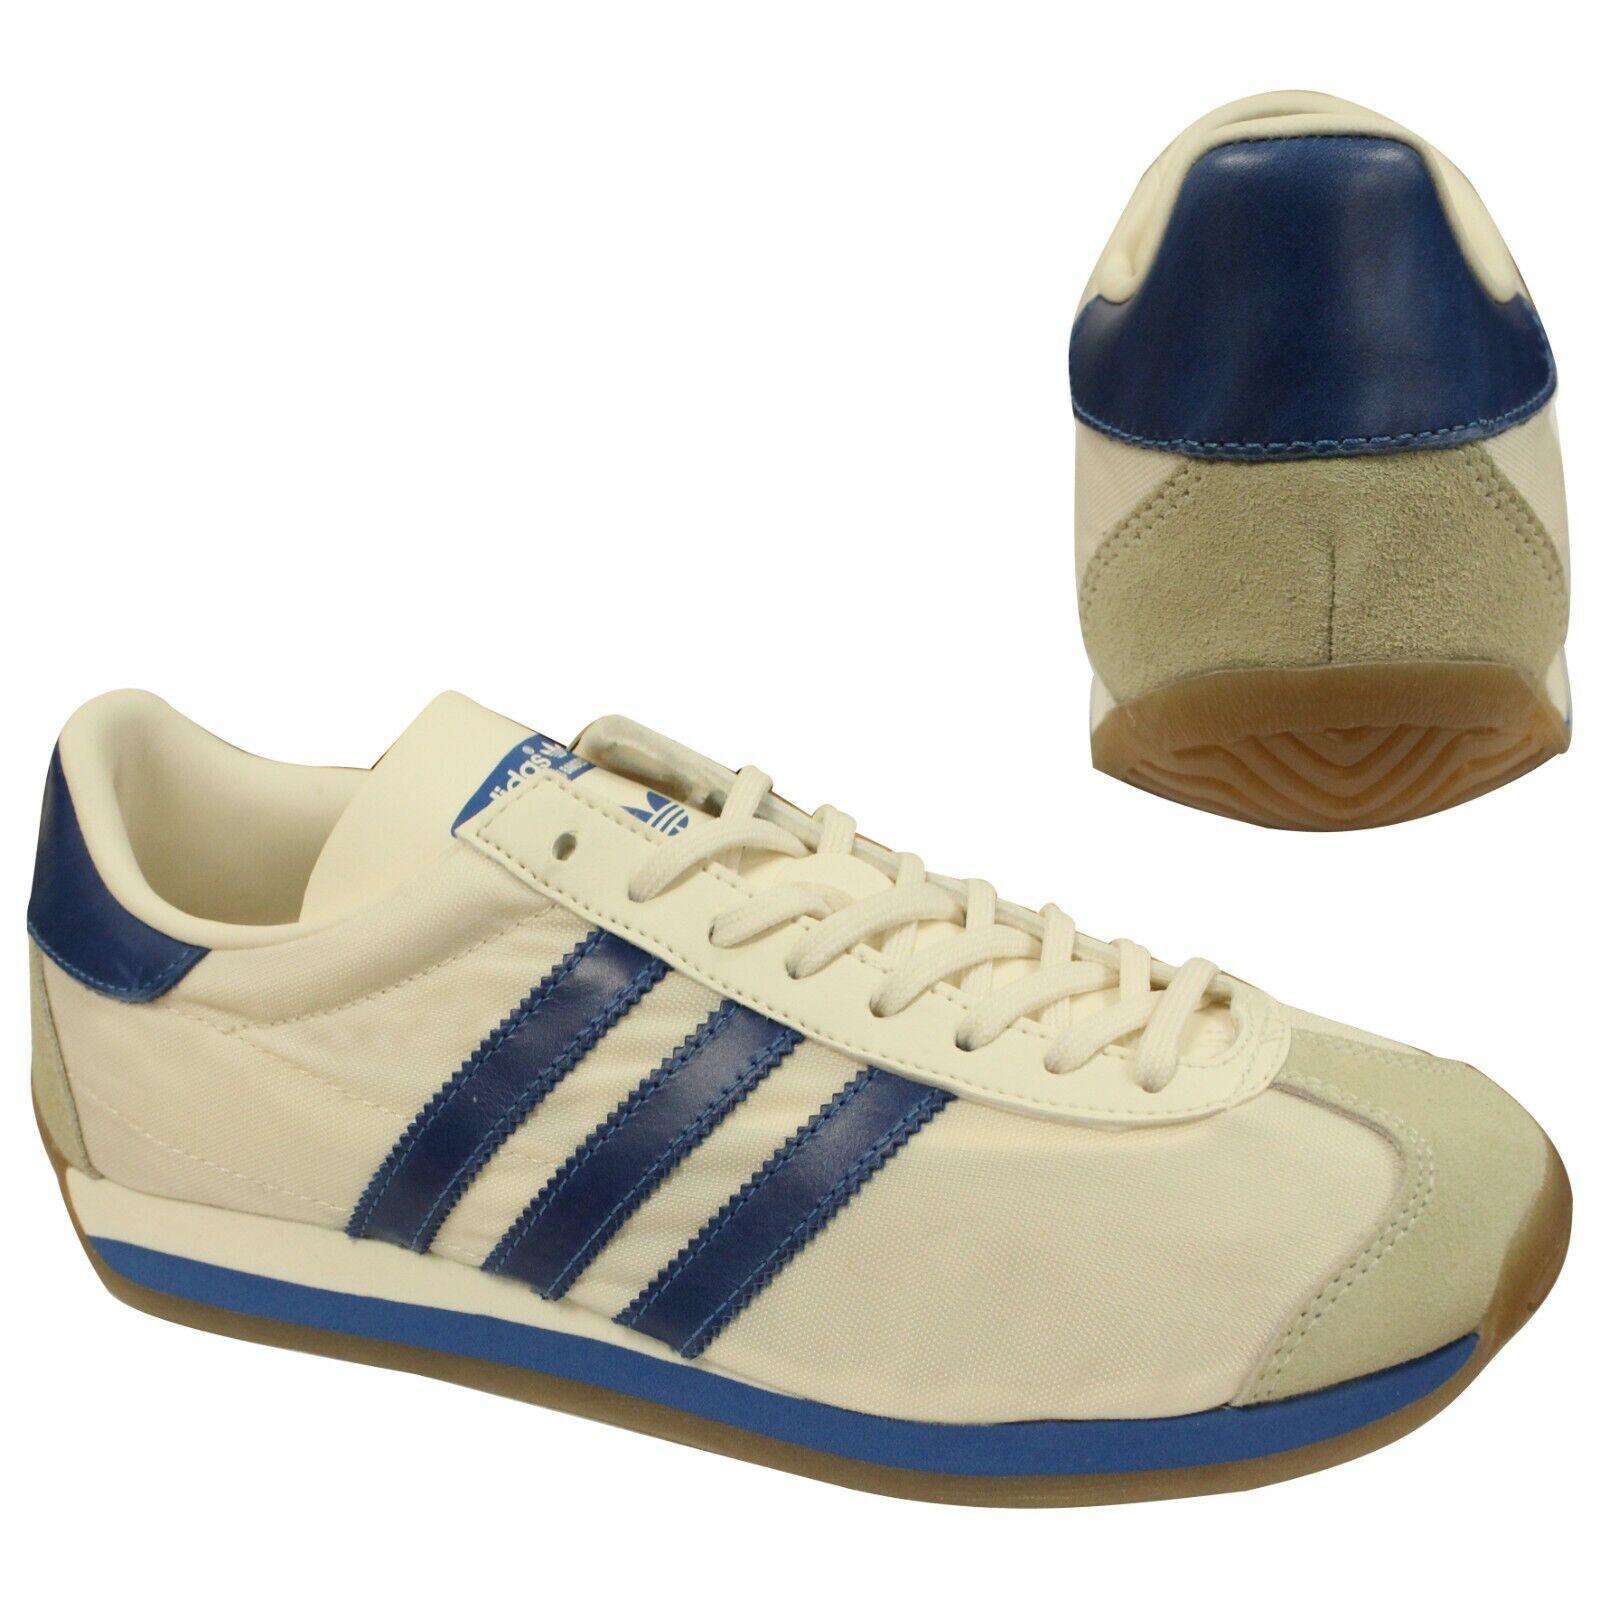 adidas originals zx 850 mens trainers